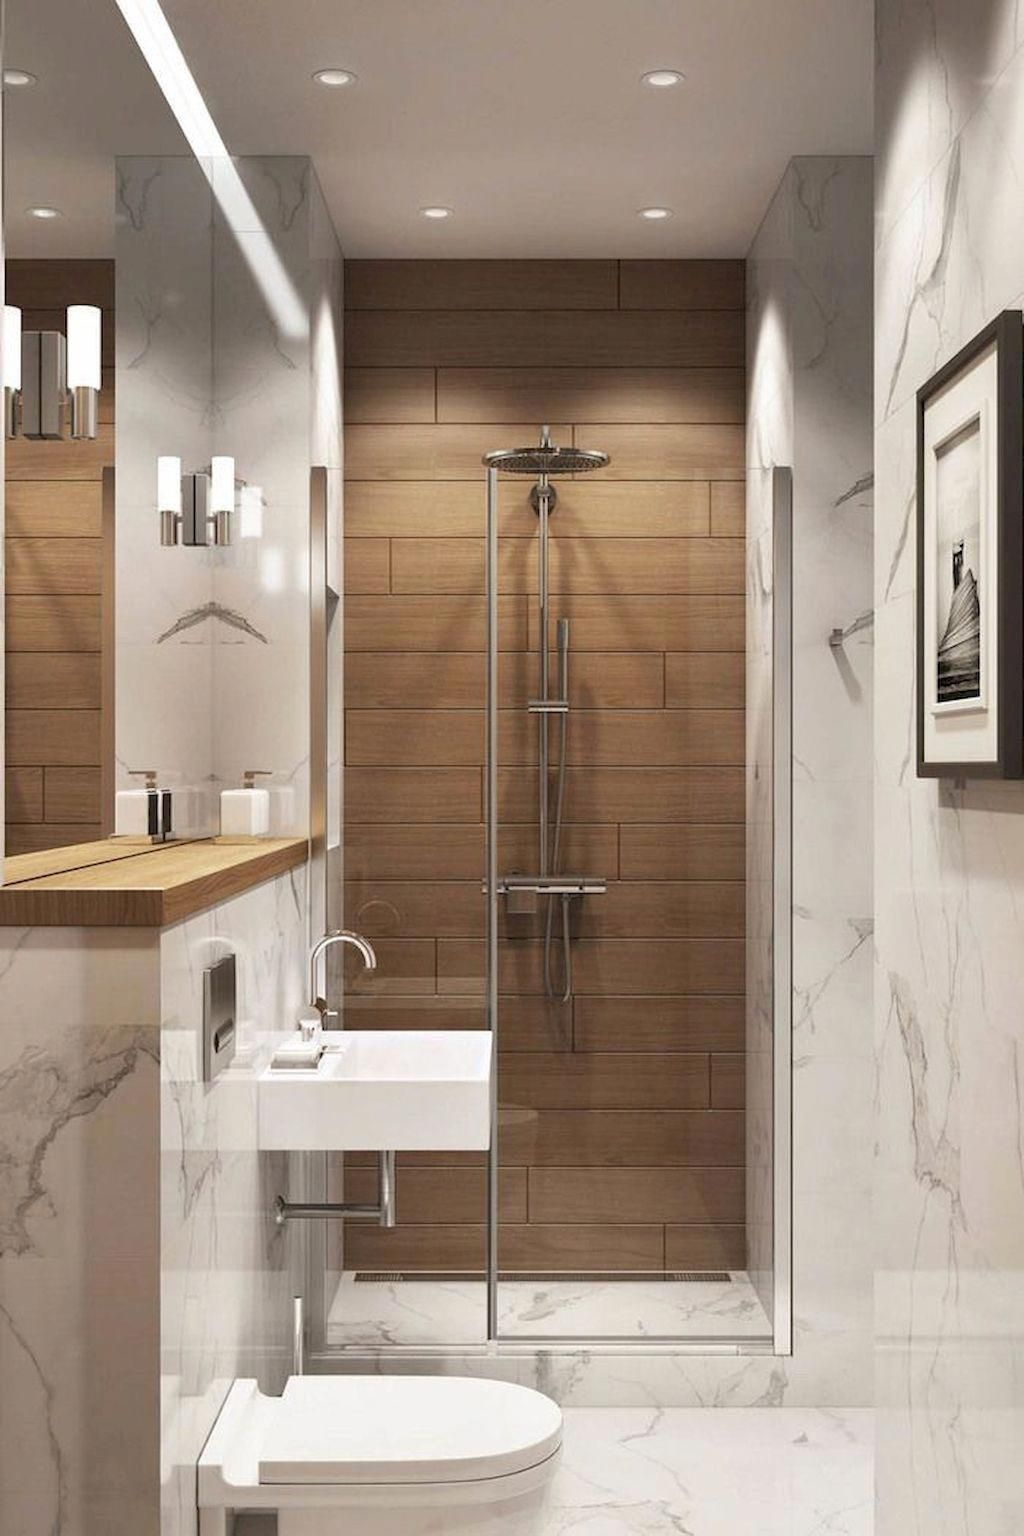 Wooden Bathroom Accessories Dark Blue Bathroom Decor Navy Blue Modern Small Bathrooms Small Bathroom Small Bathroom Decor